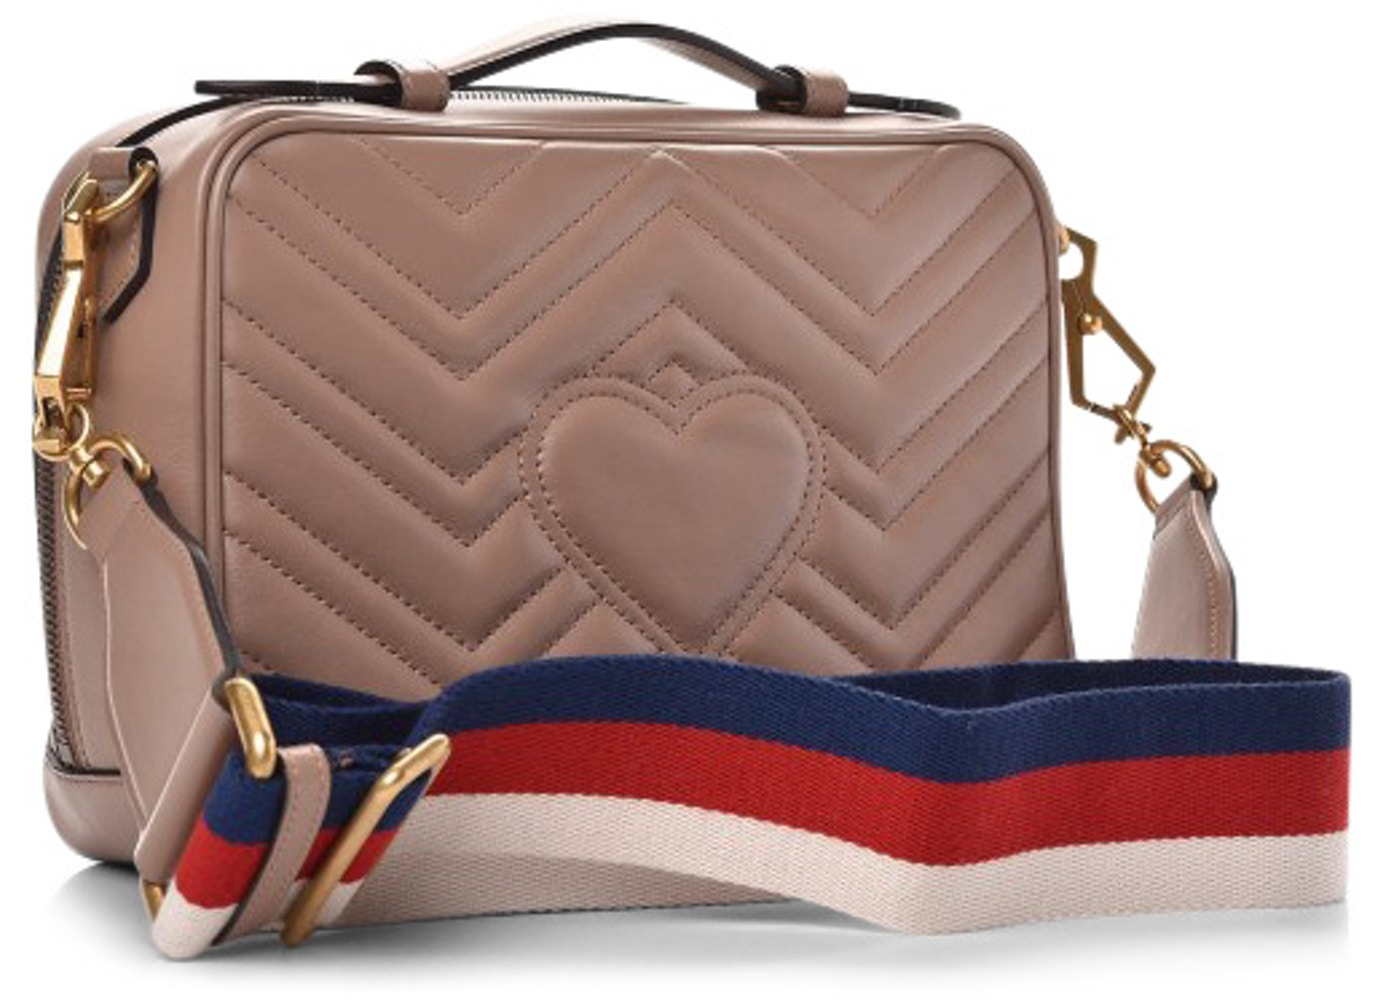 Gucci GG Marmont Mini Matelassé Nude Shoulder Bag 443496